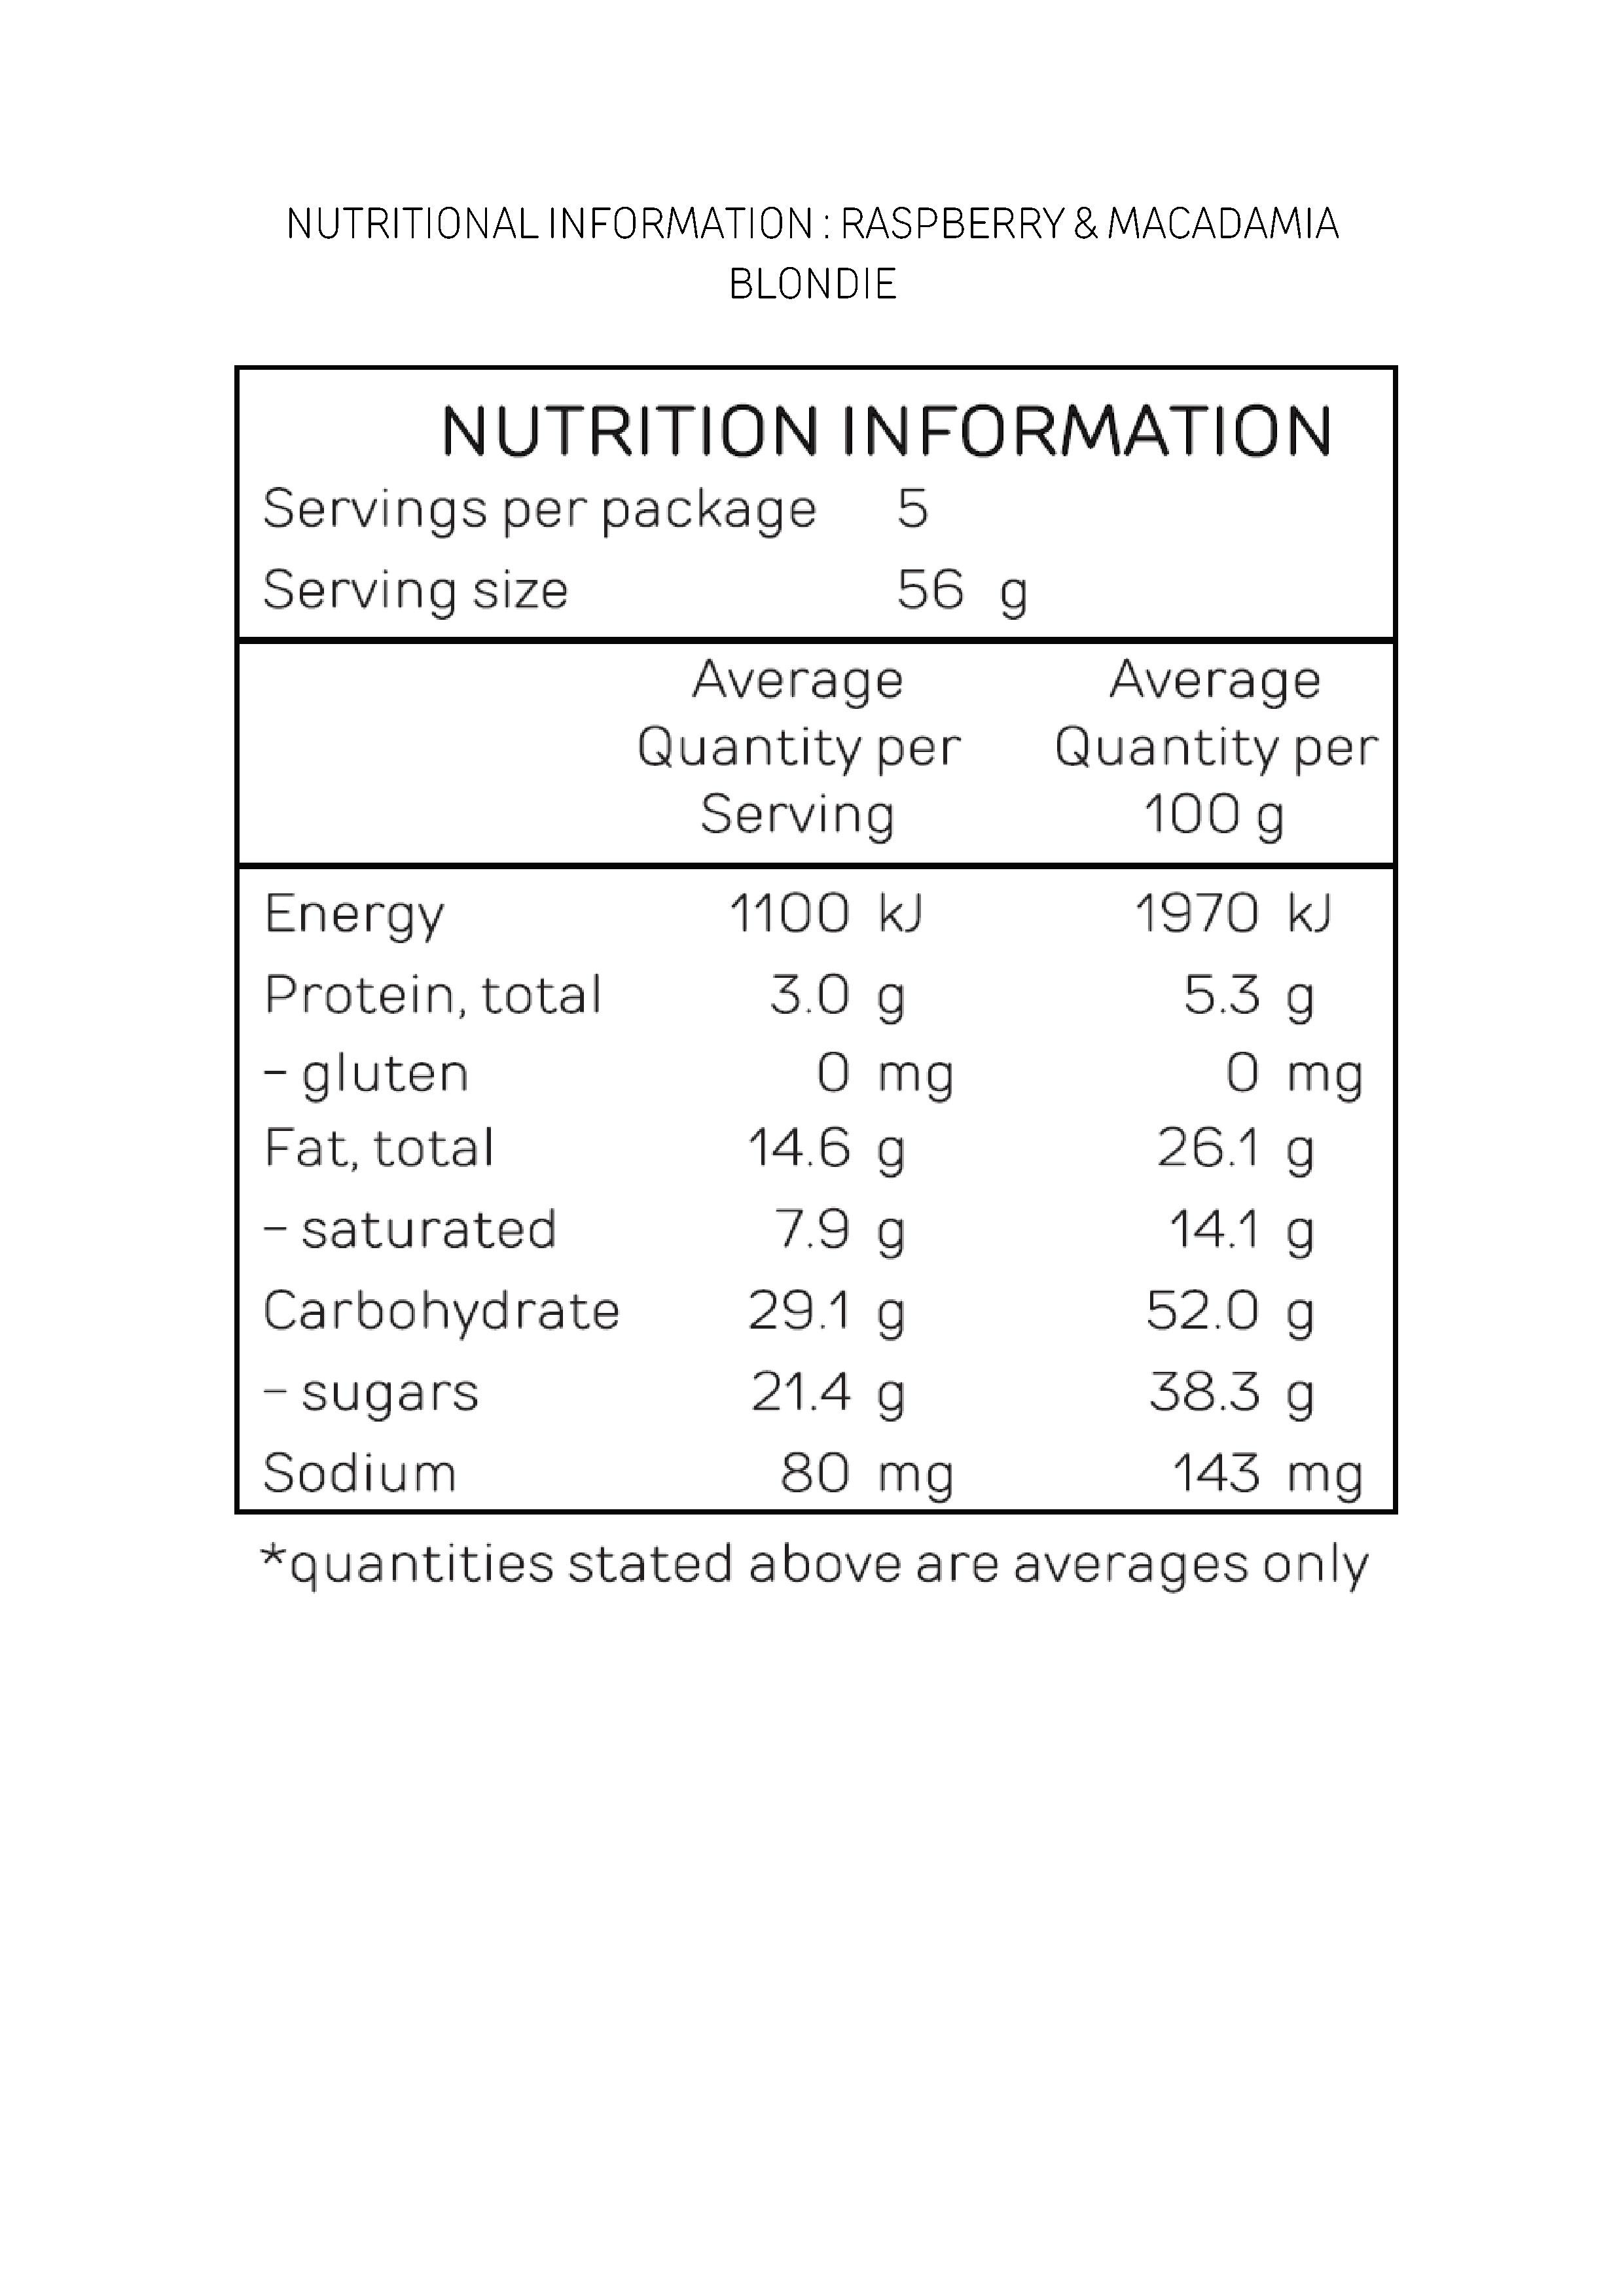 NUTRITIONAL INFORMATION_RASPBERRY & MACADAMIA BLONDIE.jpg